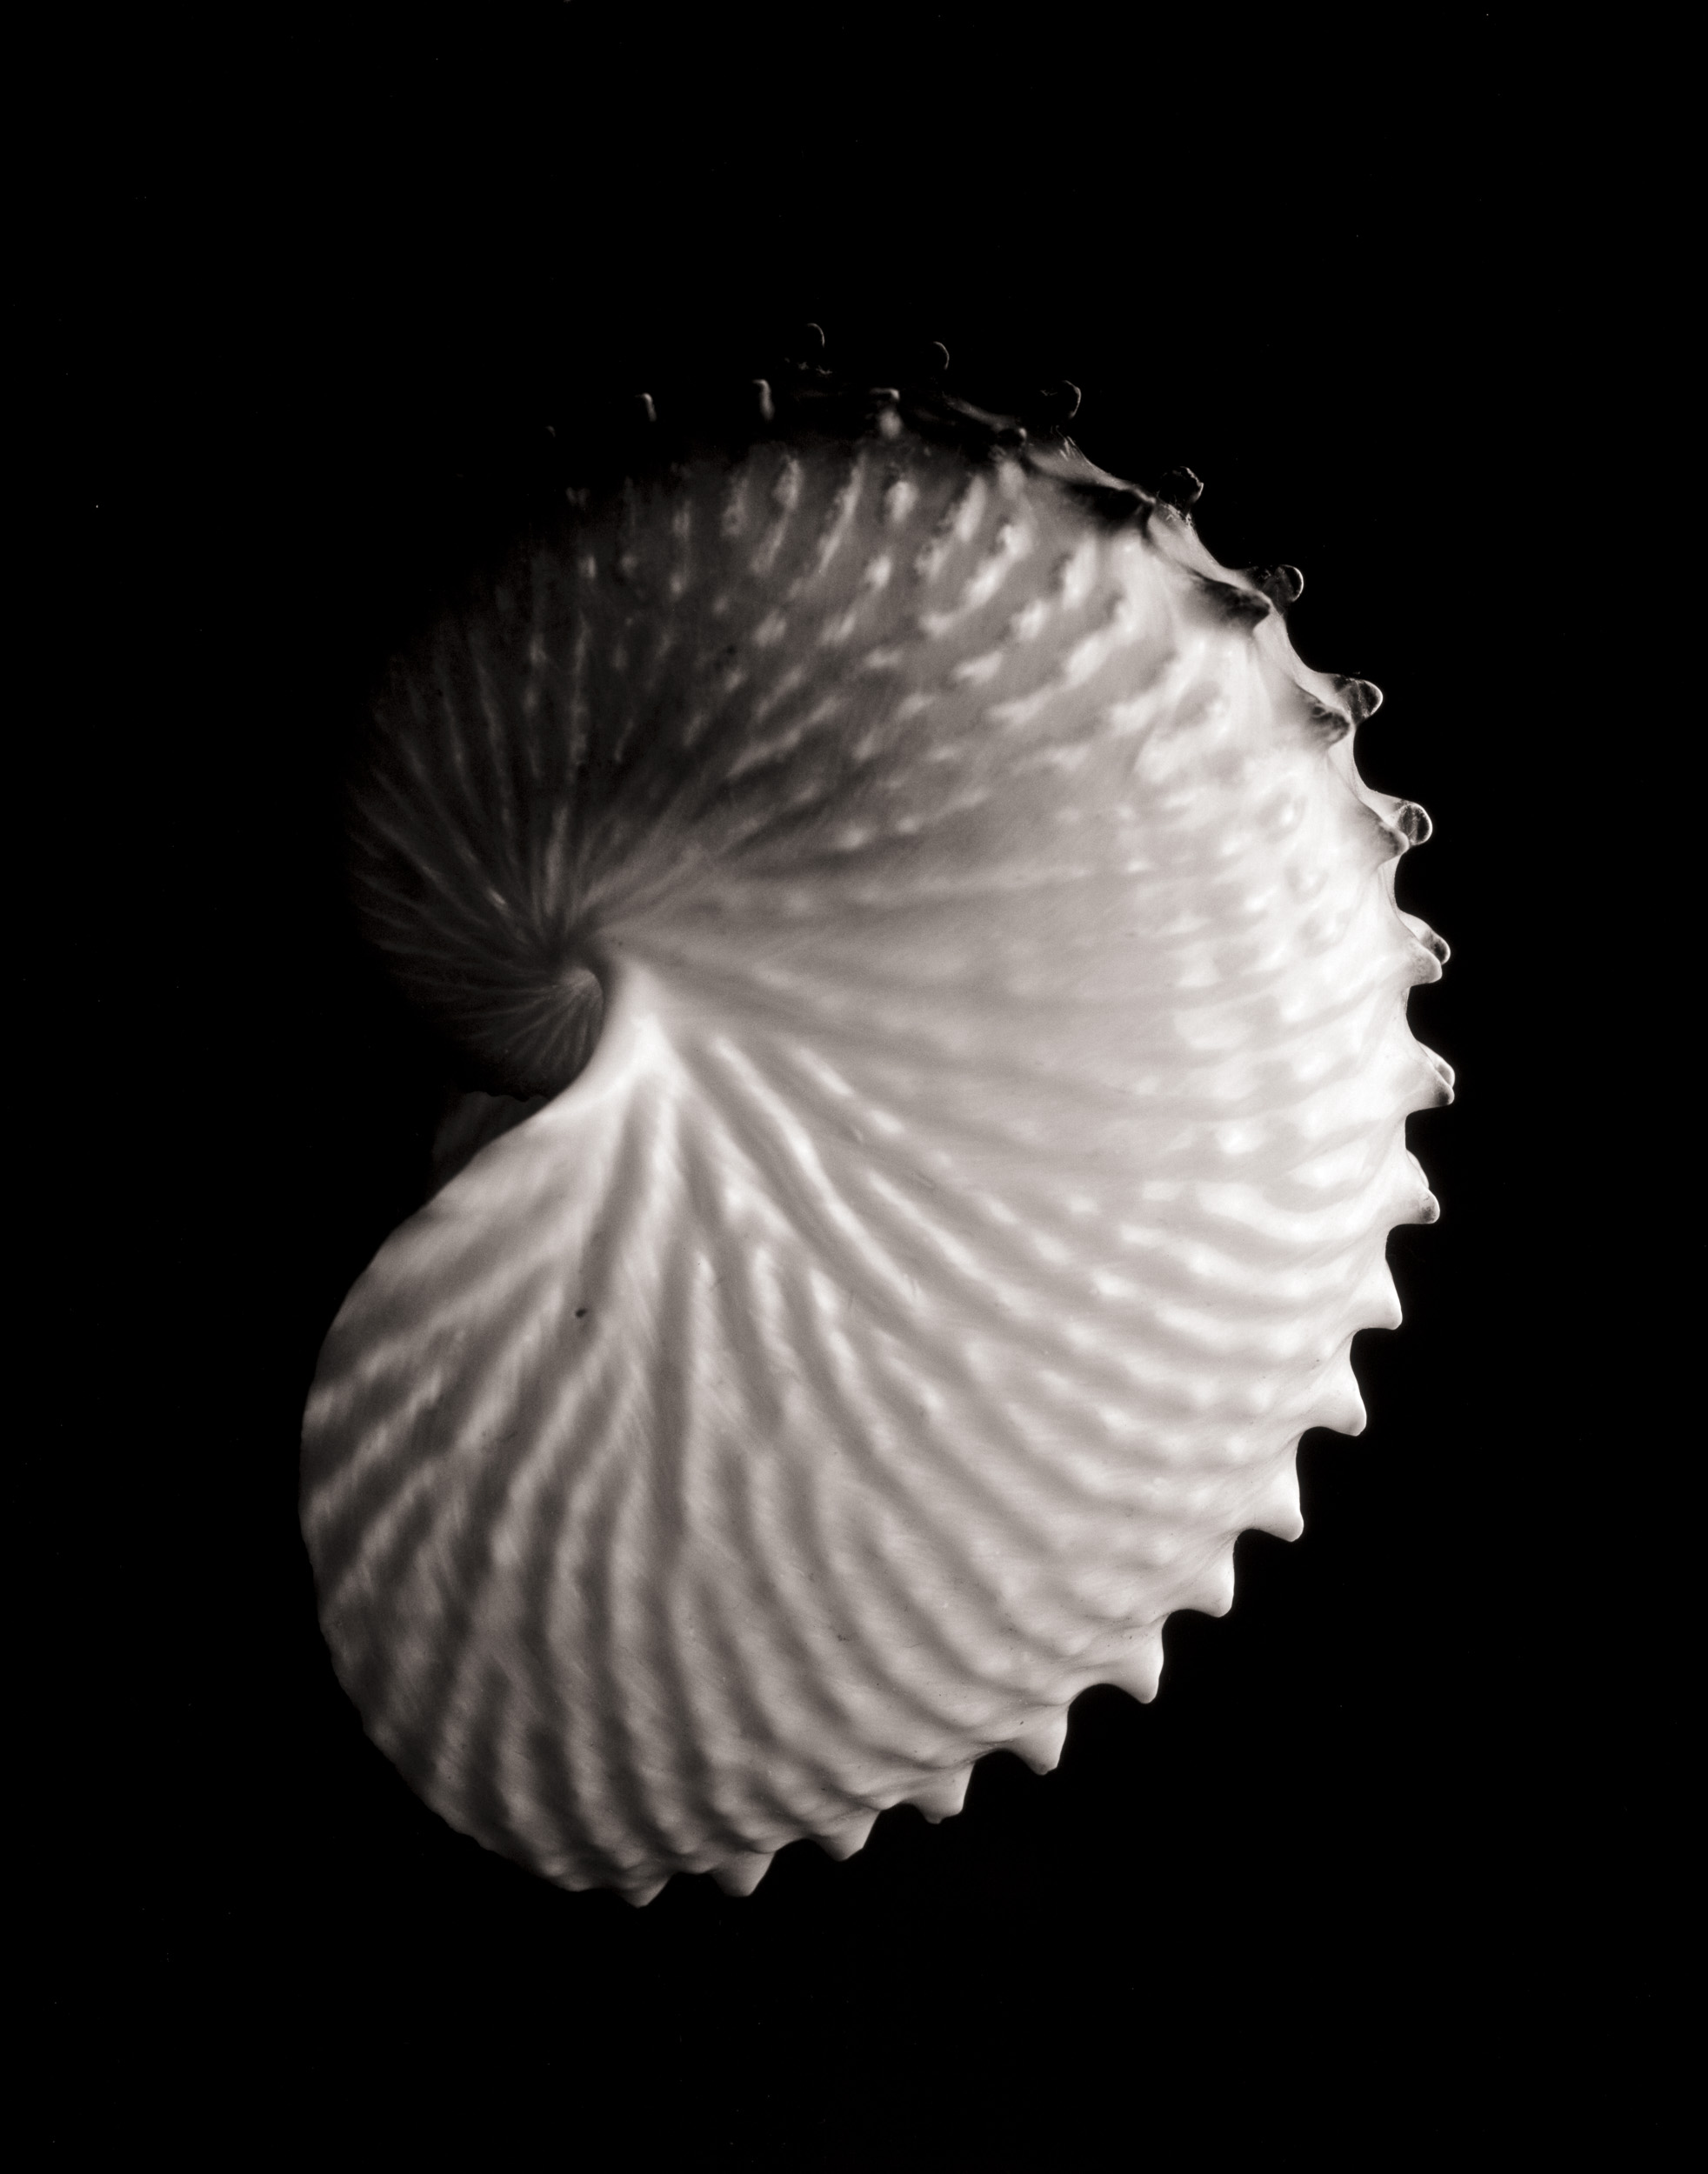 shell12_print18.jpg